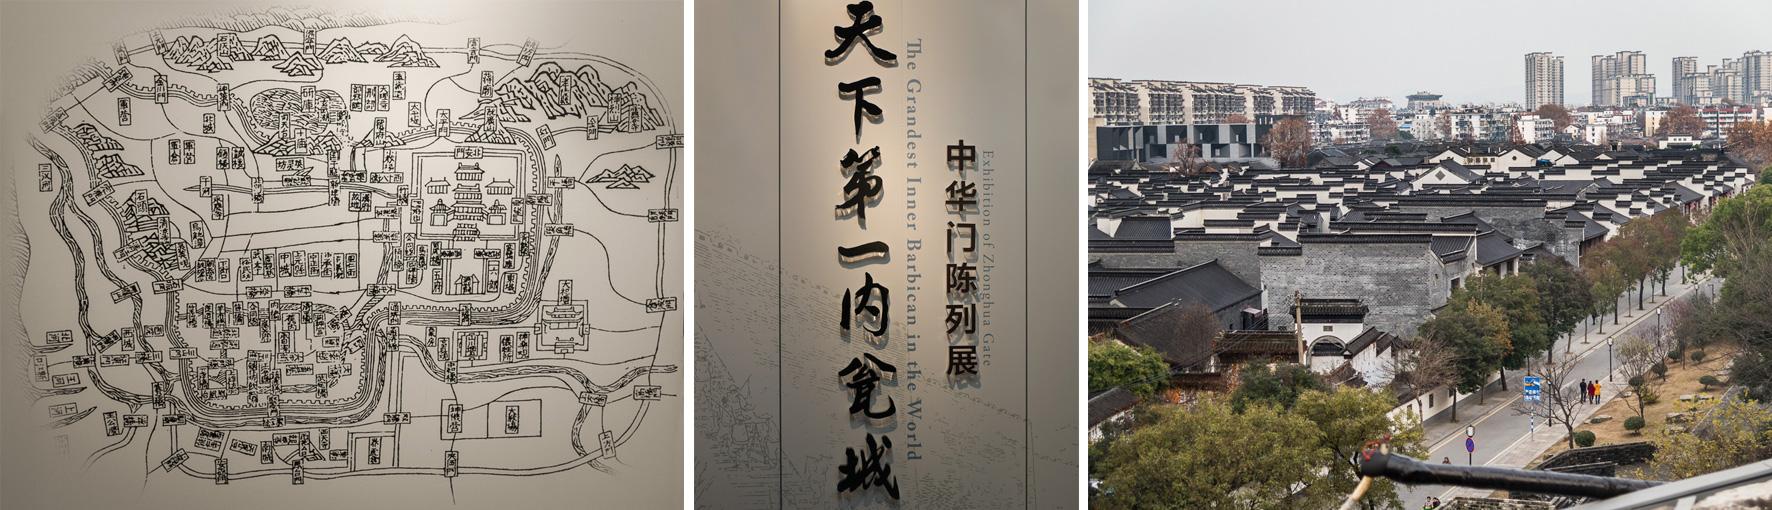 ming_city_wall